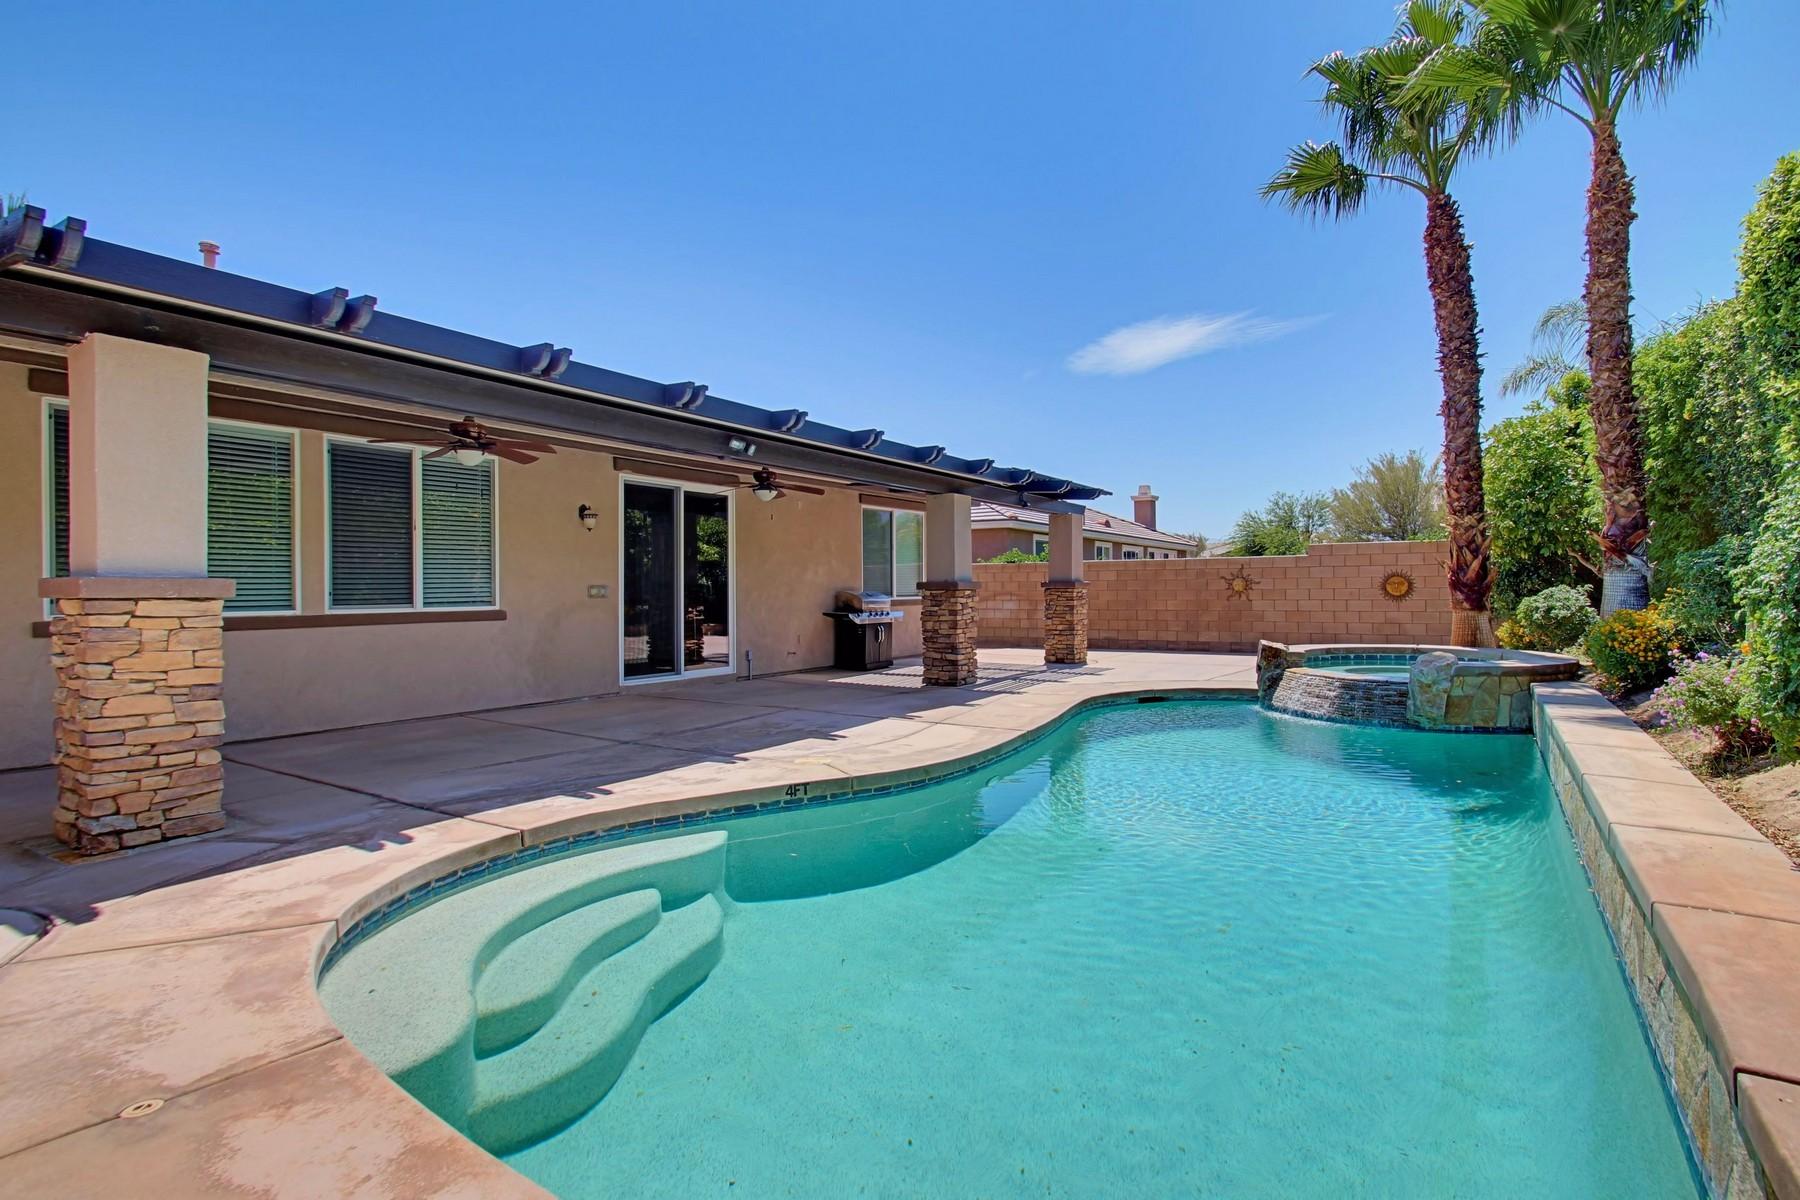 Single Family Home for Sale at 82278 Padova Drive Indio, California 92203 United States